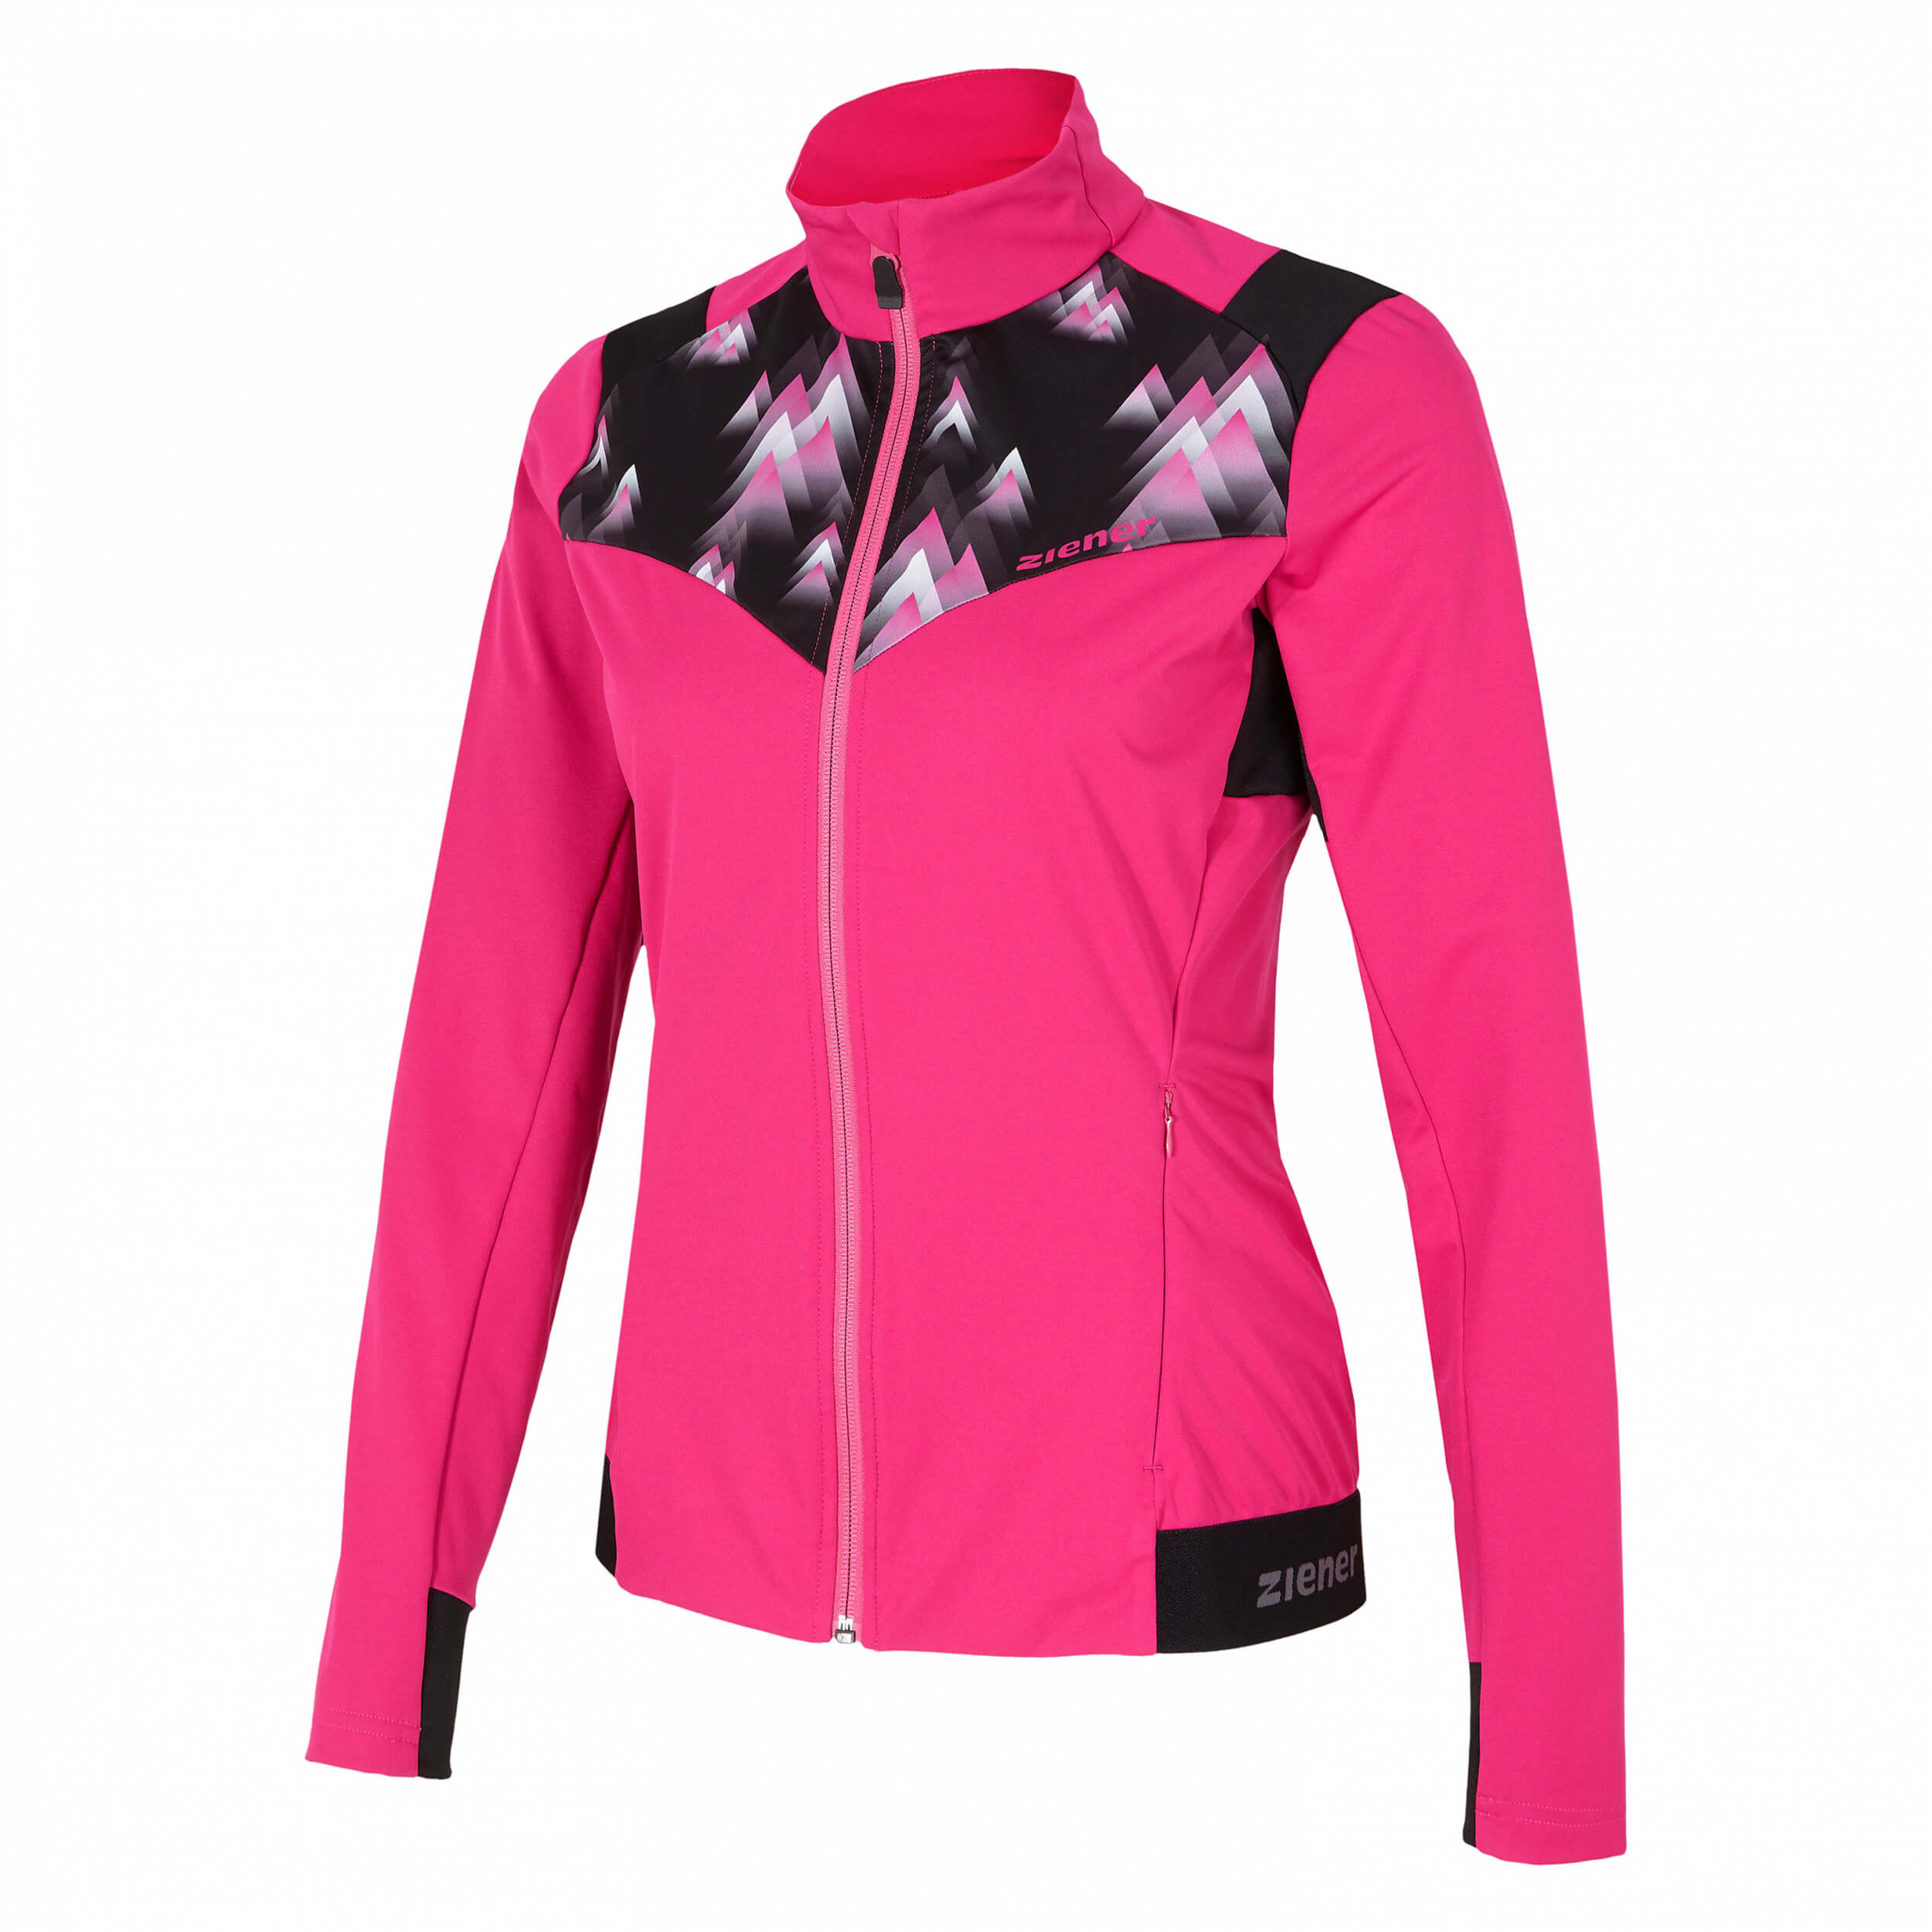 ZIENER Damen Softshell Jacke Narit pink 861